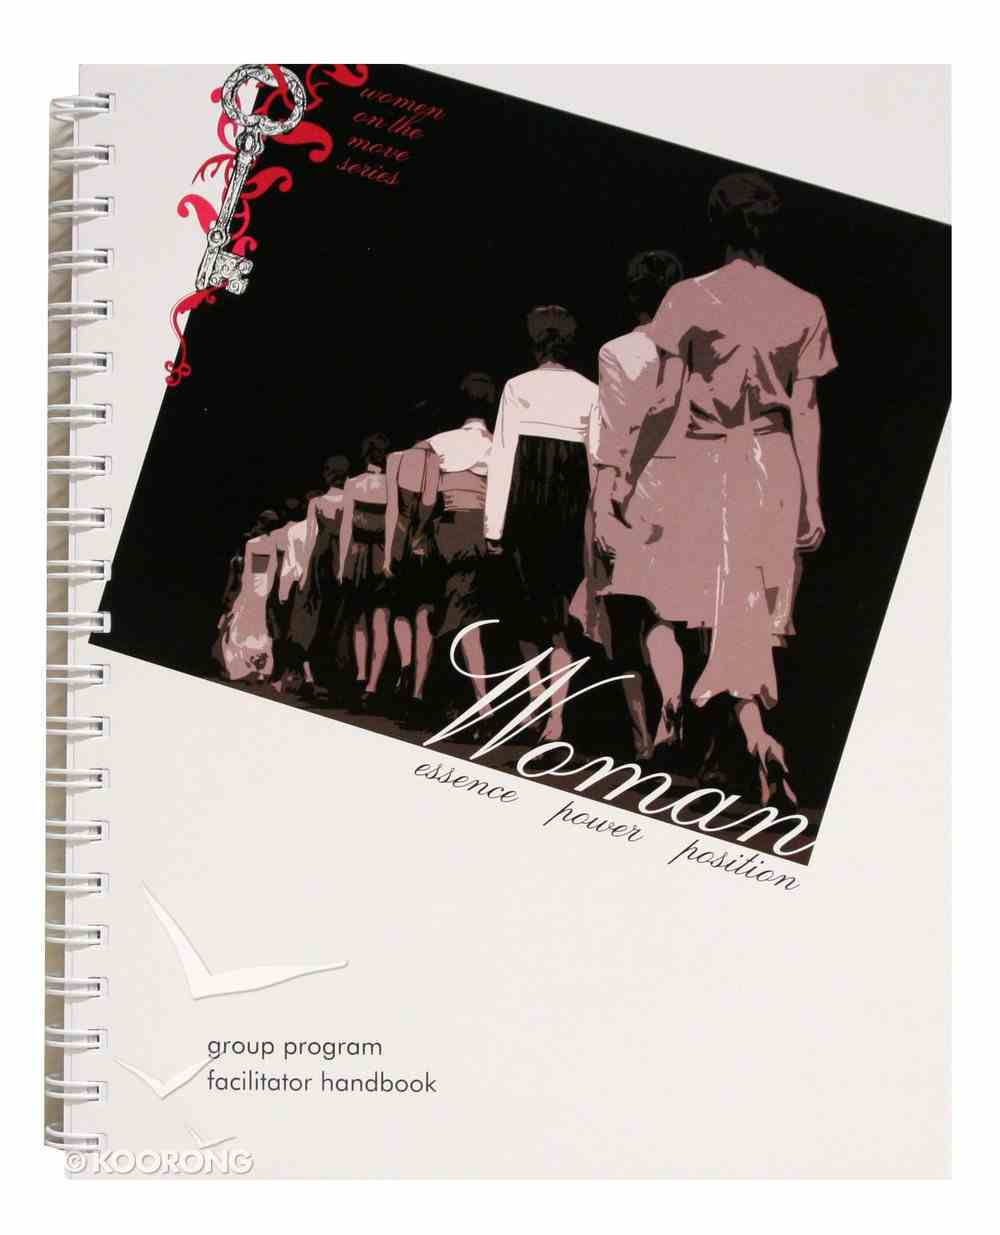 Woman (Facilitator Handbook) Spiral